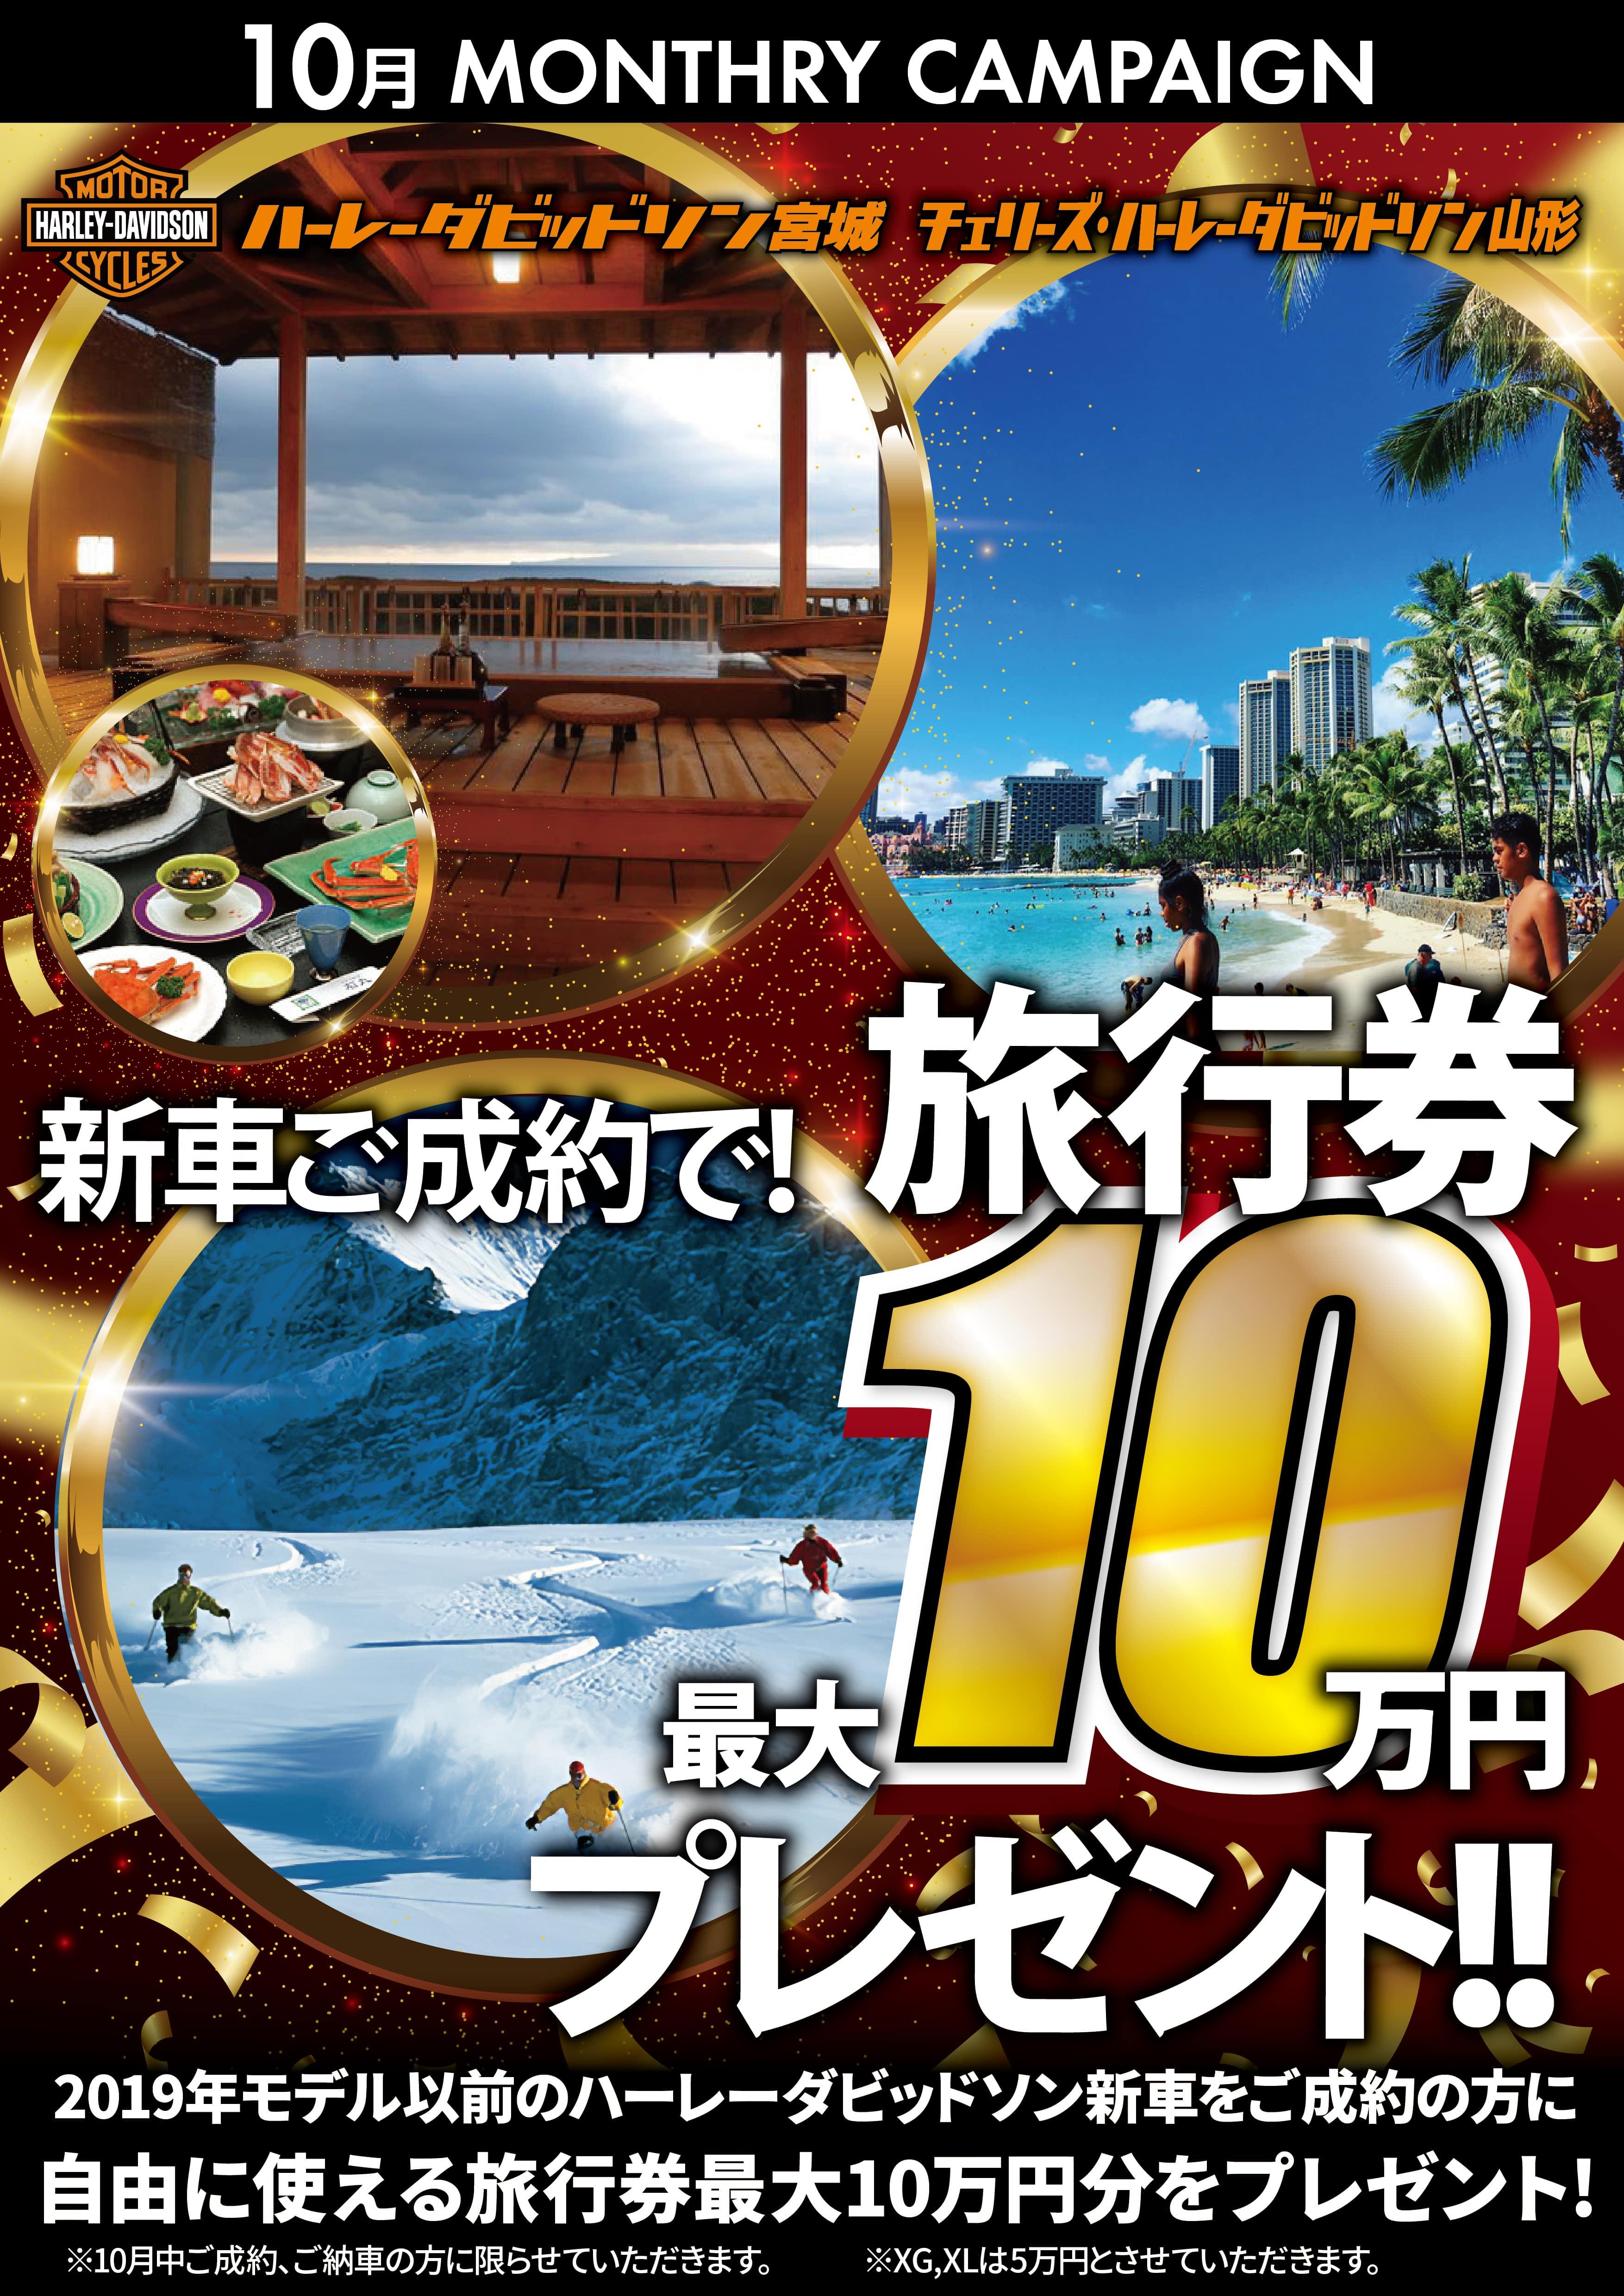 201910HD旅行券10万円3-01-min